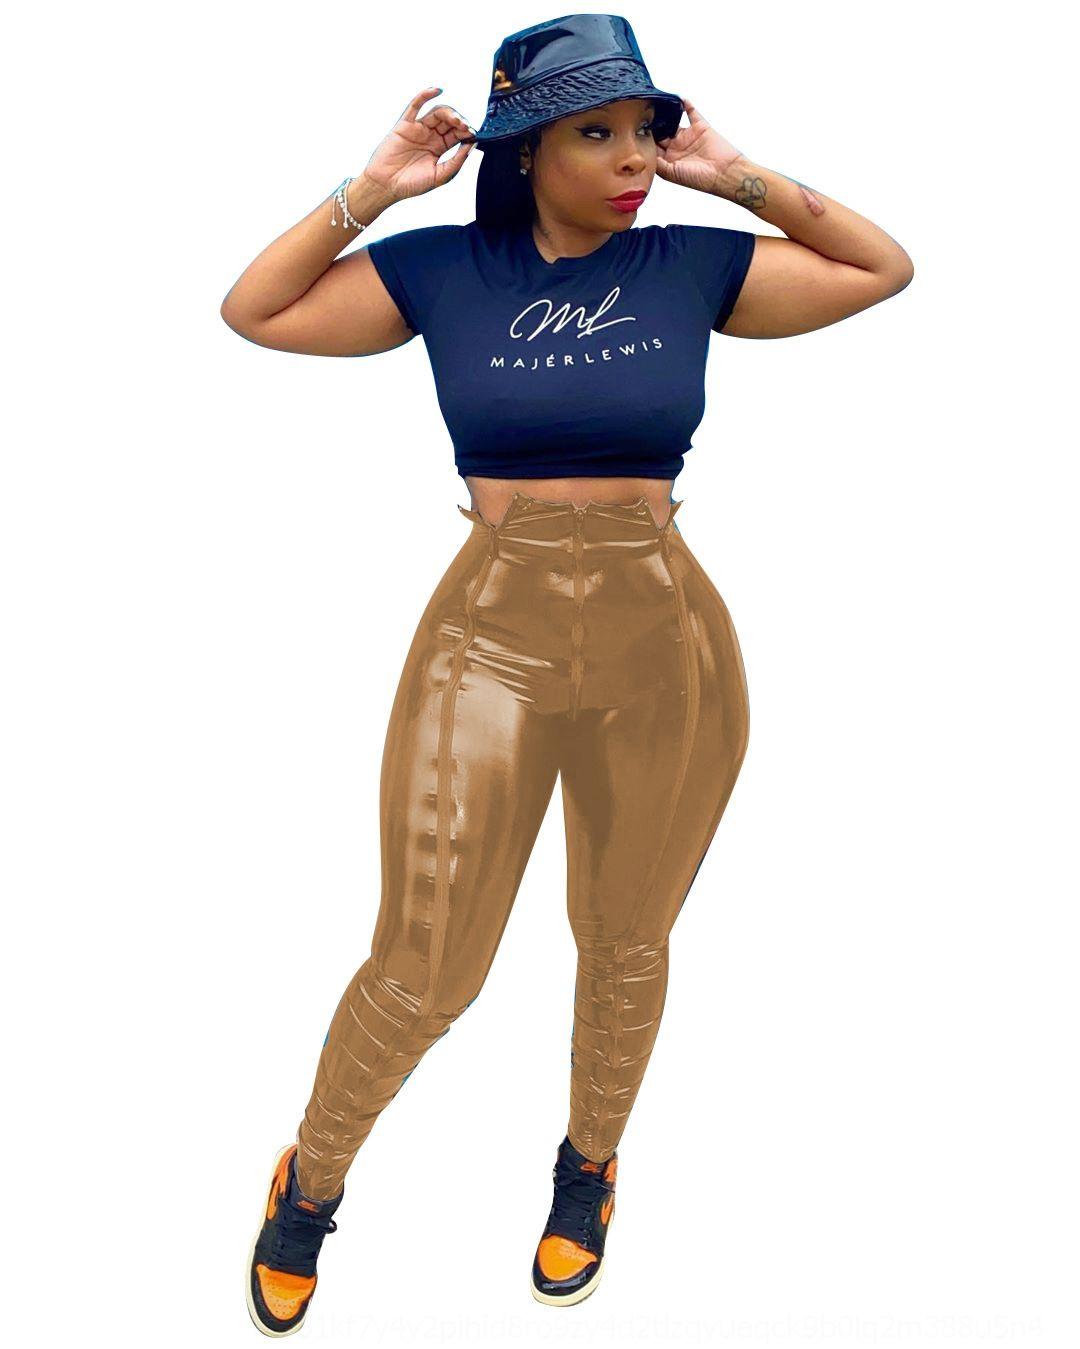 Qxry Weeeep Sweatpants 2018 Yüksek Bel Yan Kalem Pantolon Rahat Streetwear Kadın Bayan Pantolon Ekose Pantolon Checkerboard